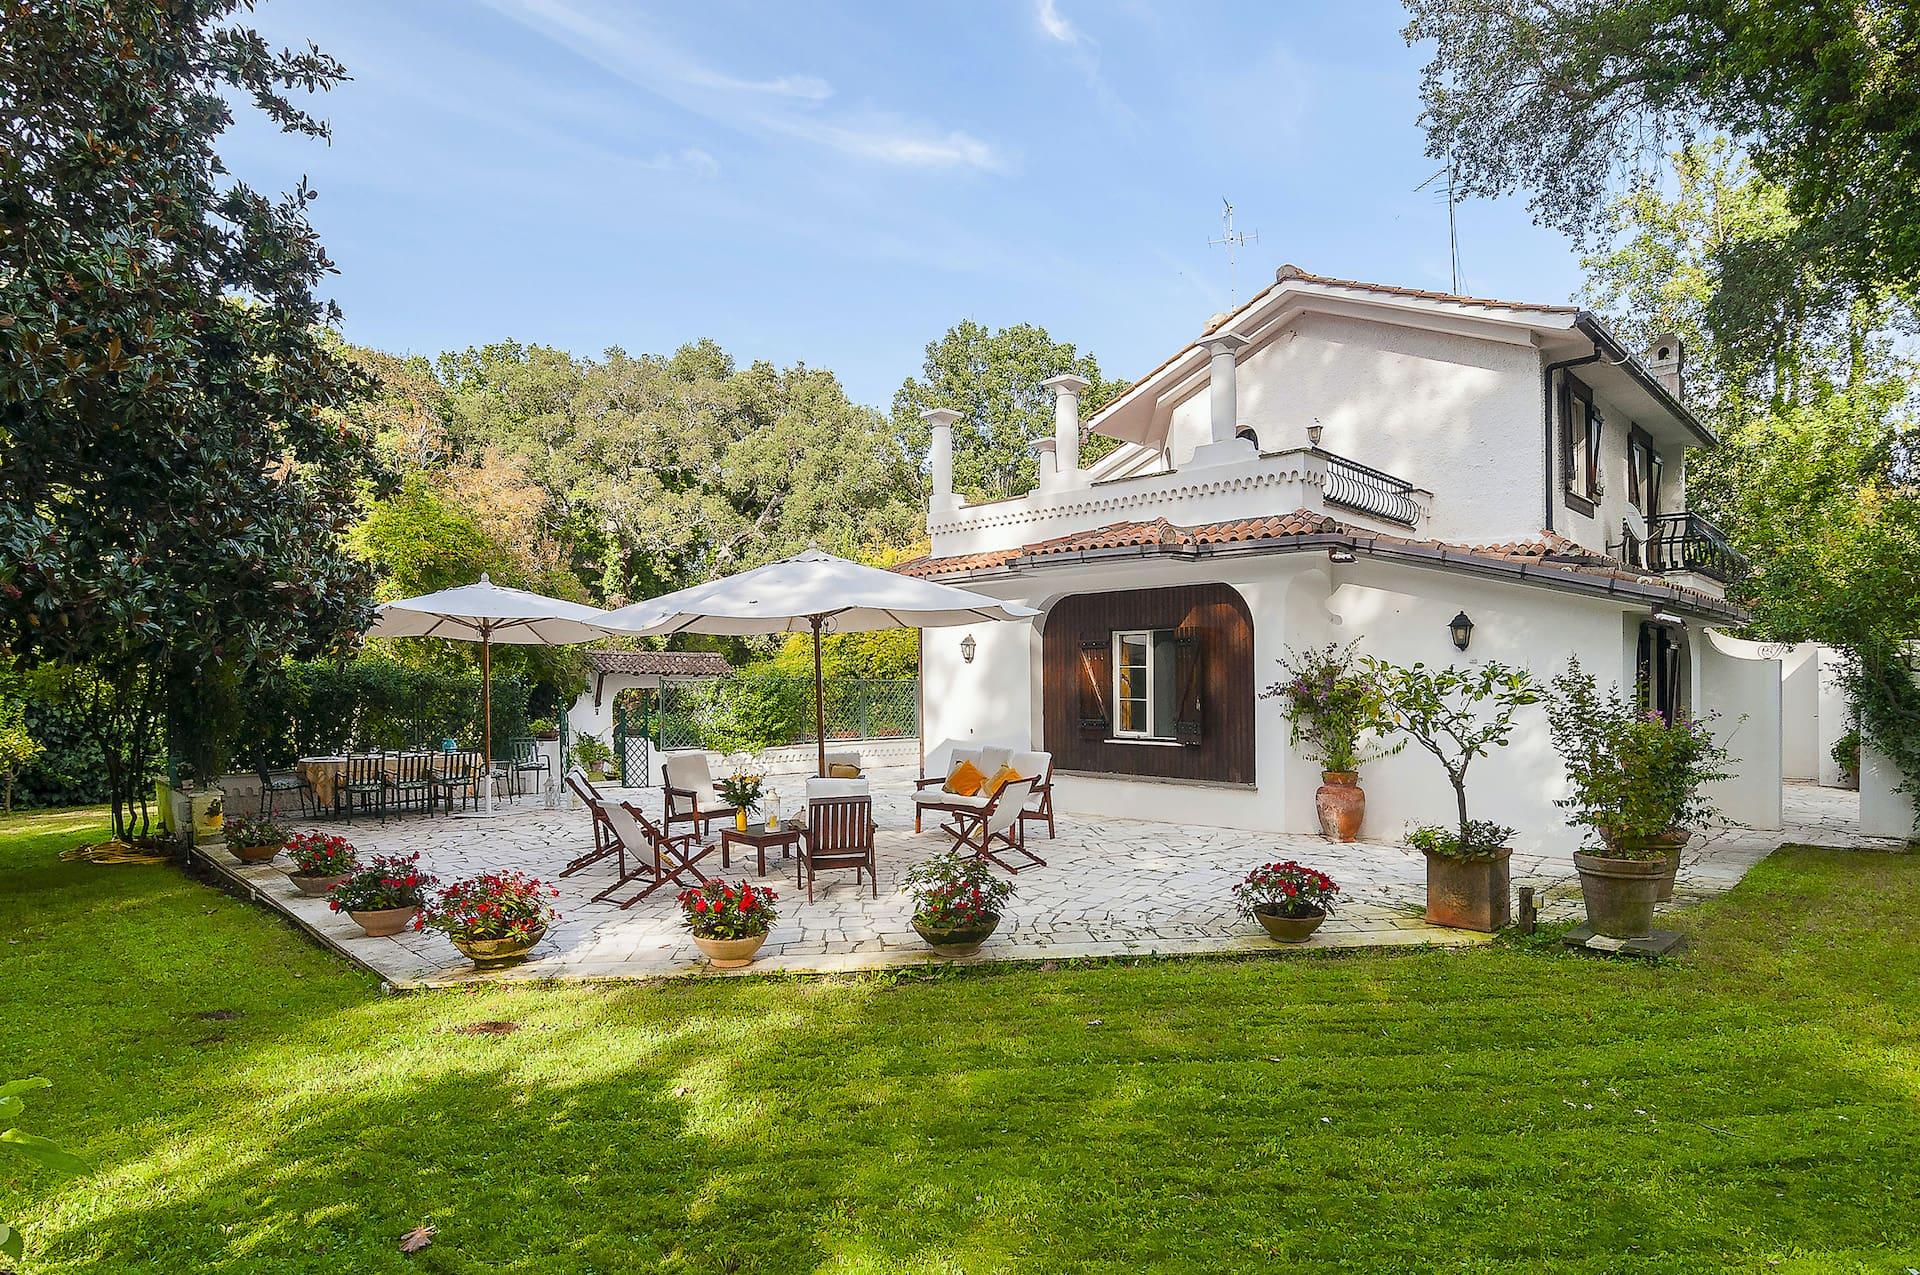 spaciuos garden front view - Villa Lancerotti Sabaudia